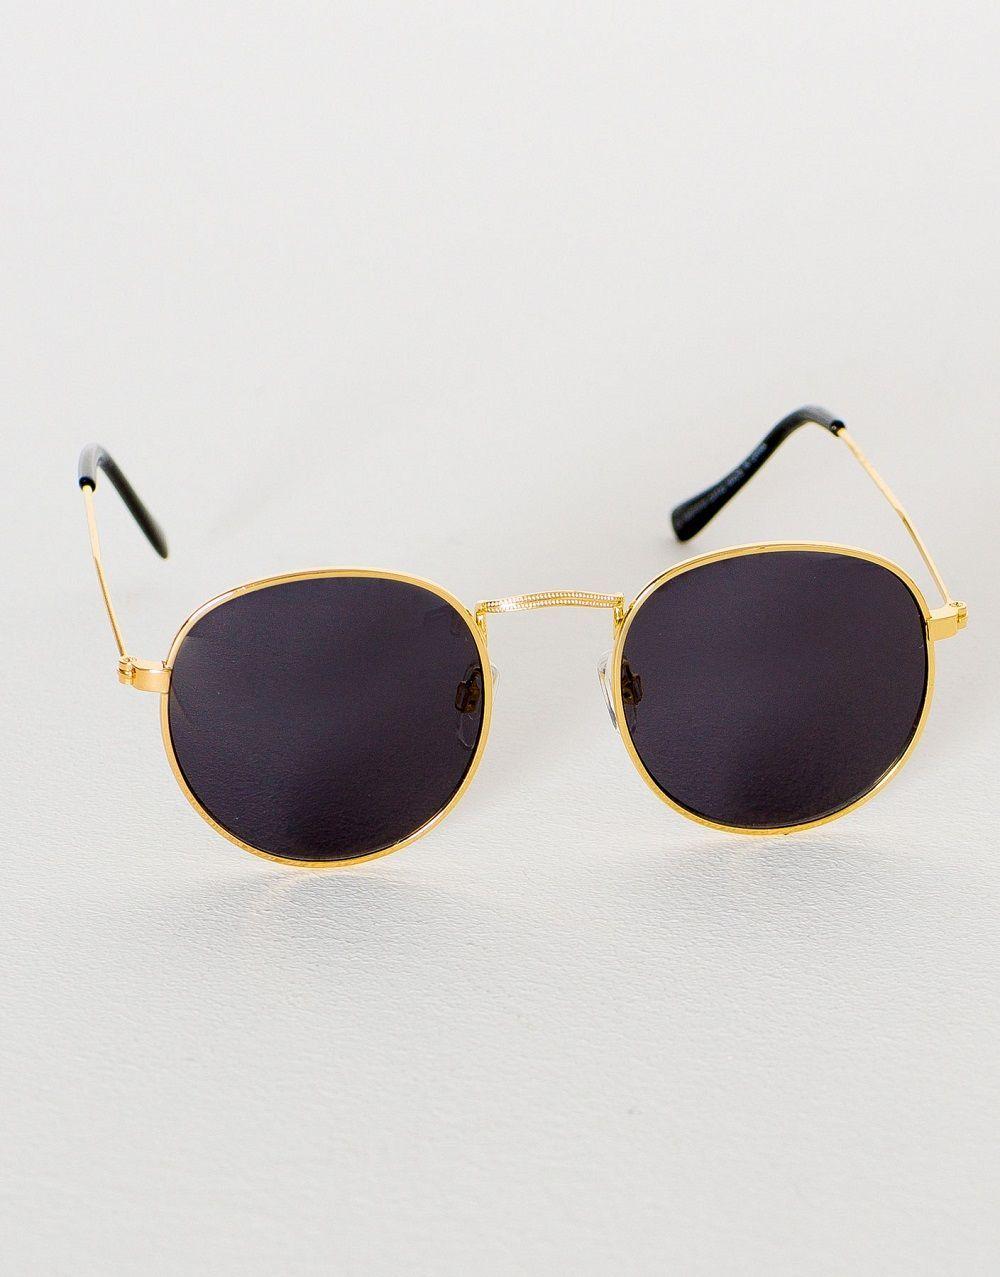 5 Kacamata Keren untuk Kamu Pakai Sehari-hari